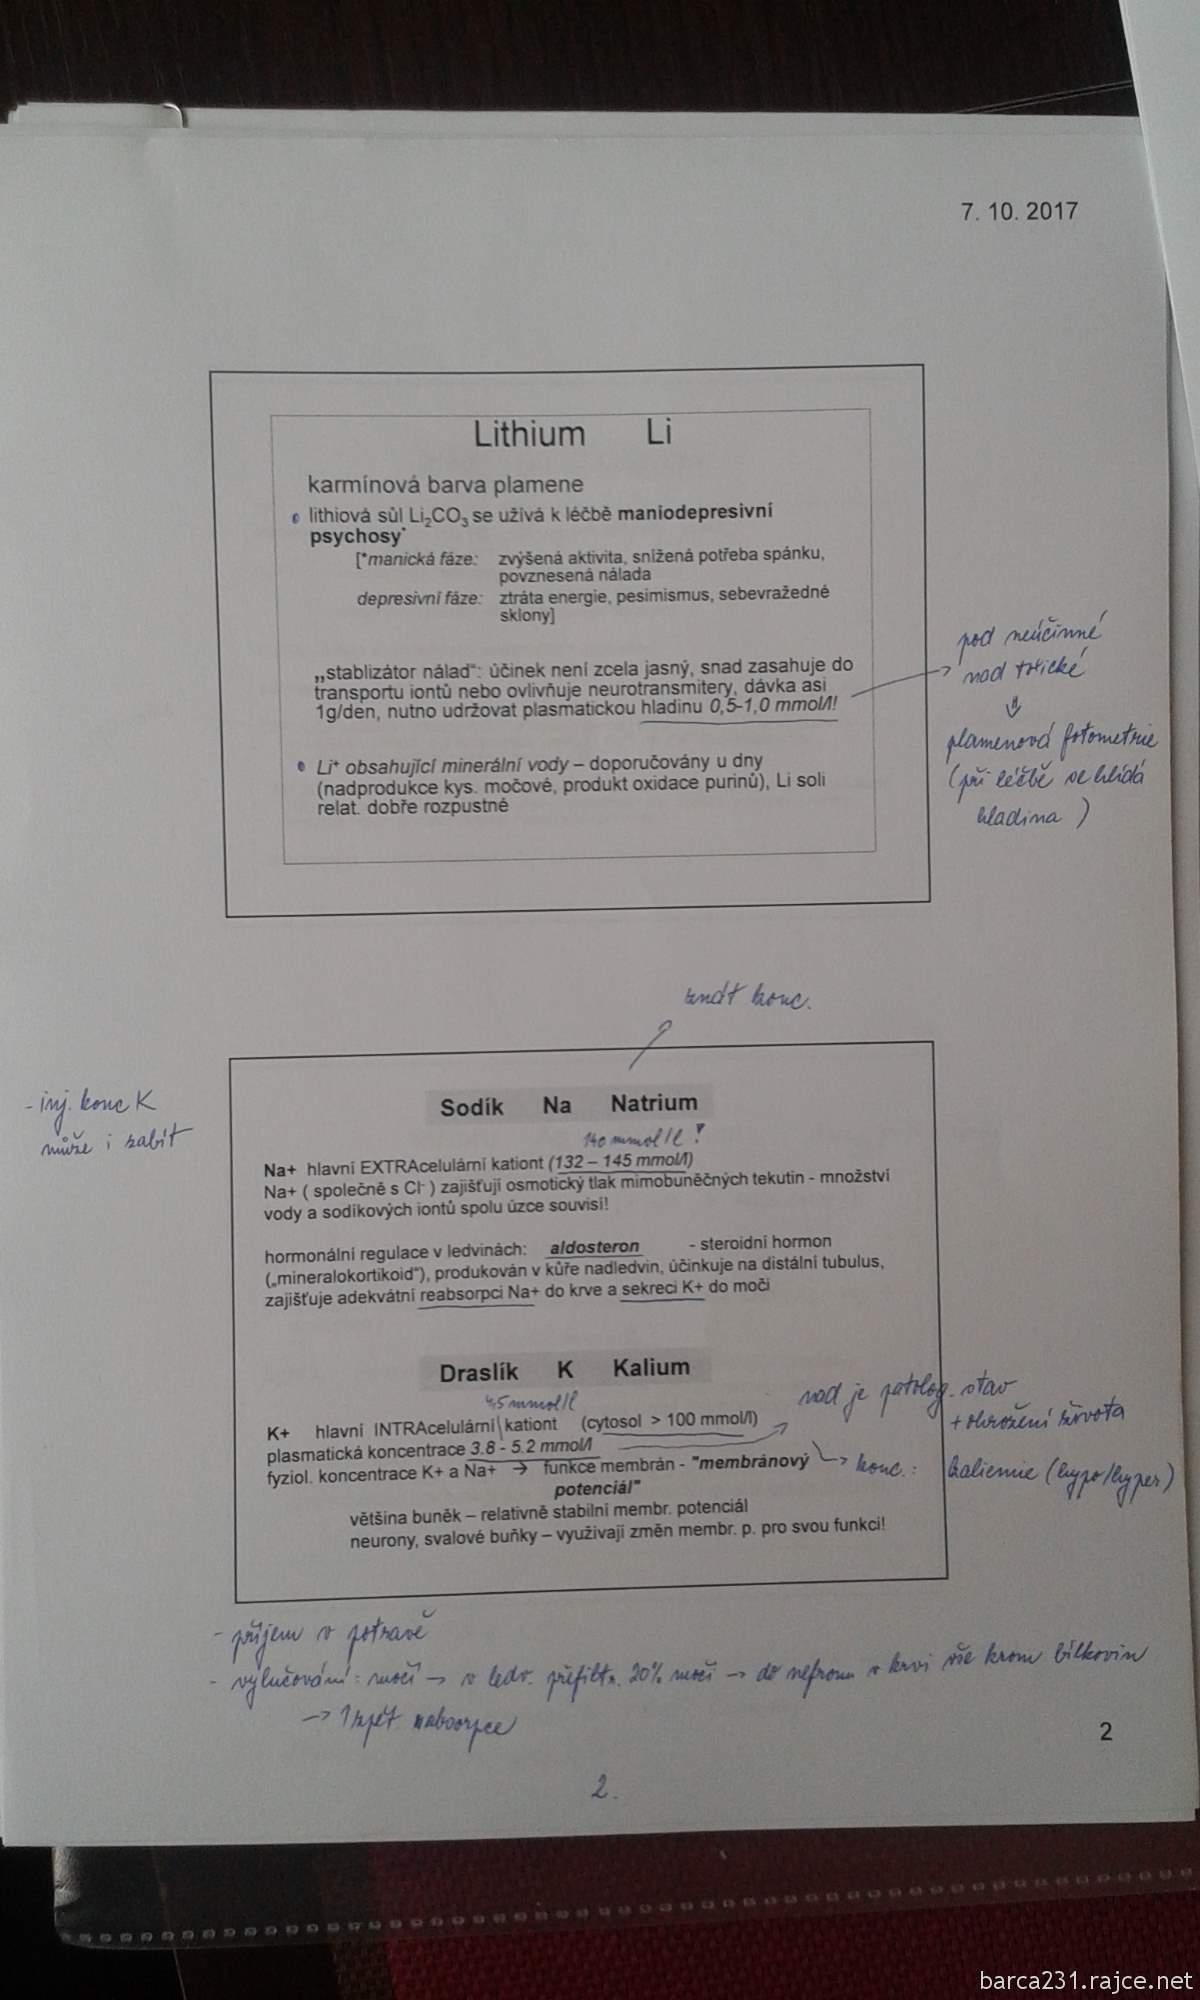 Chemie Prednasky I Ii Barca231 Album Na Rajceti